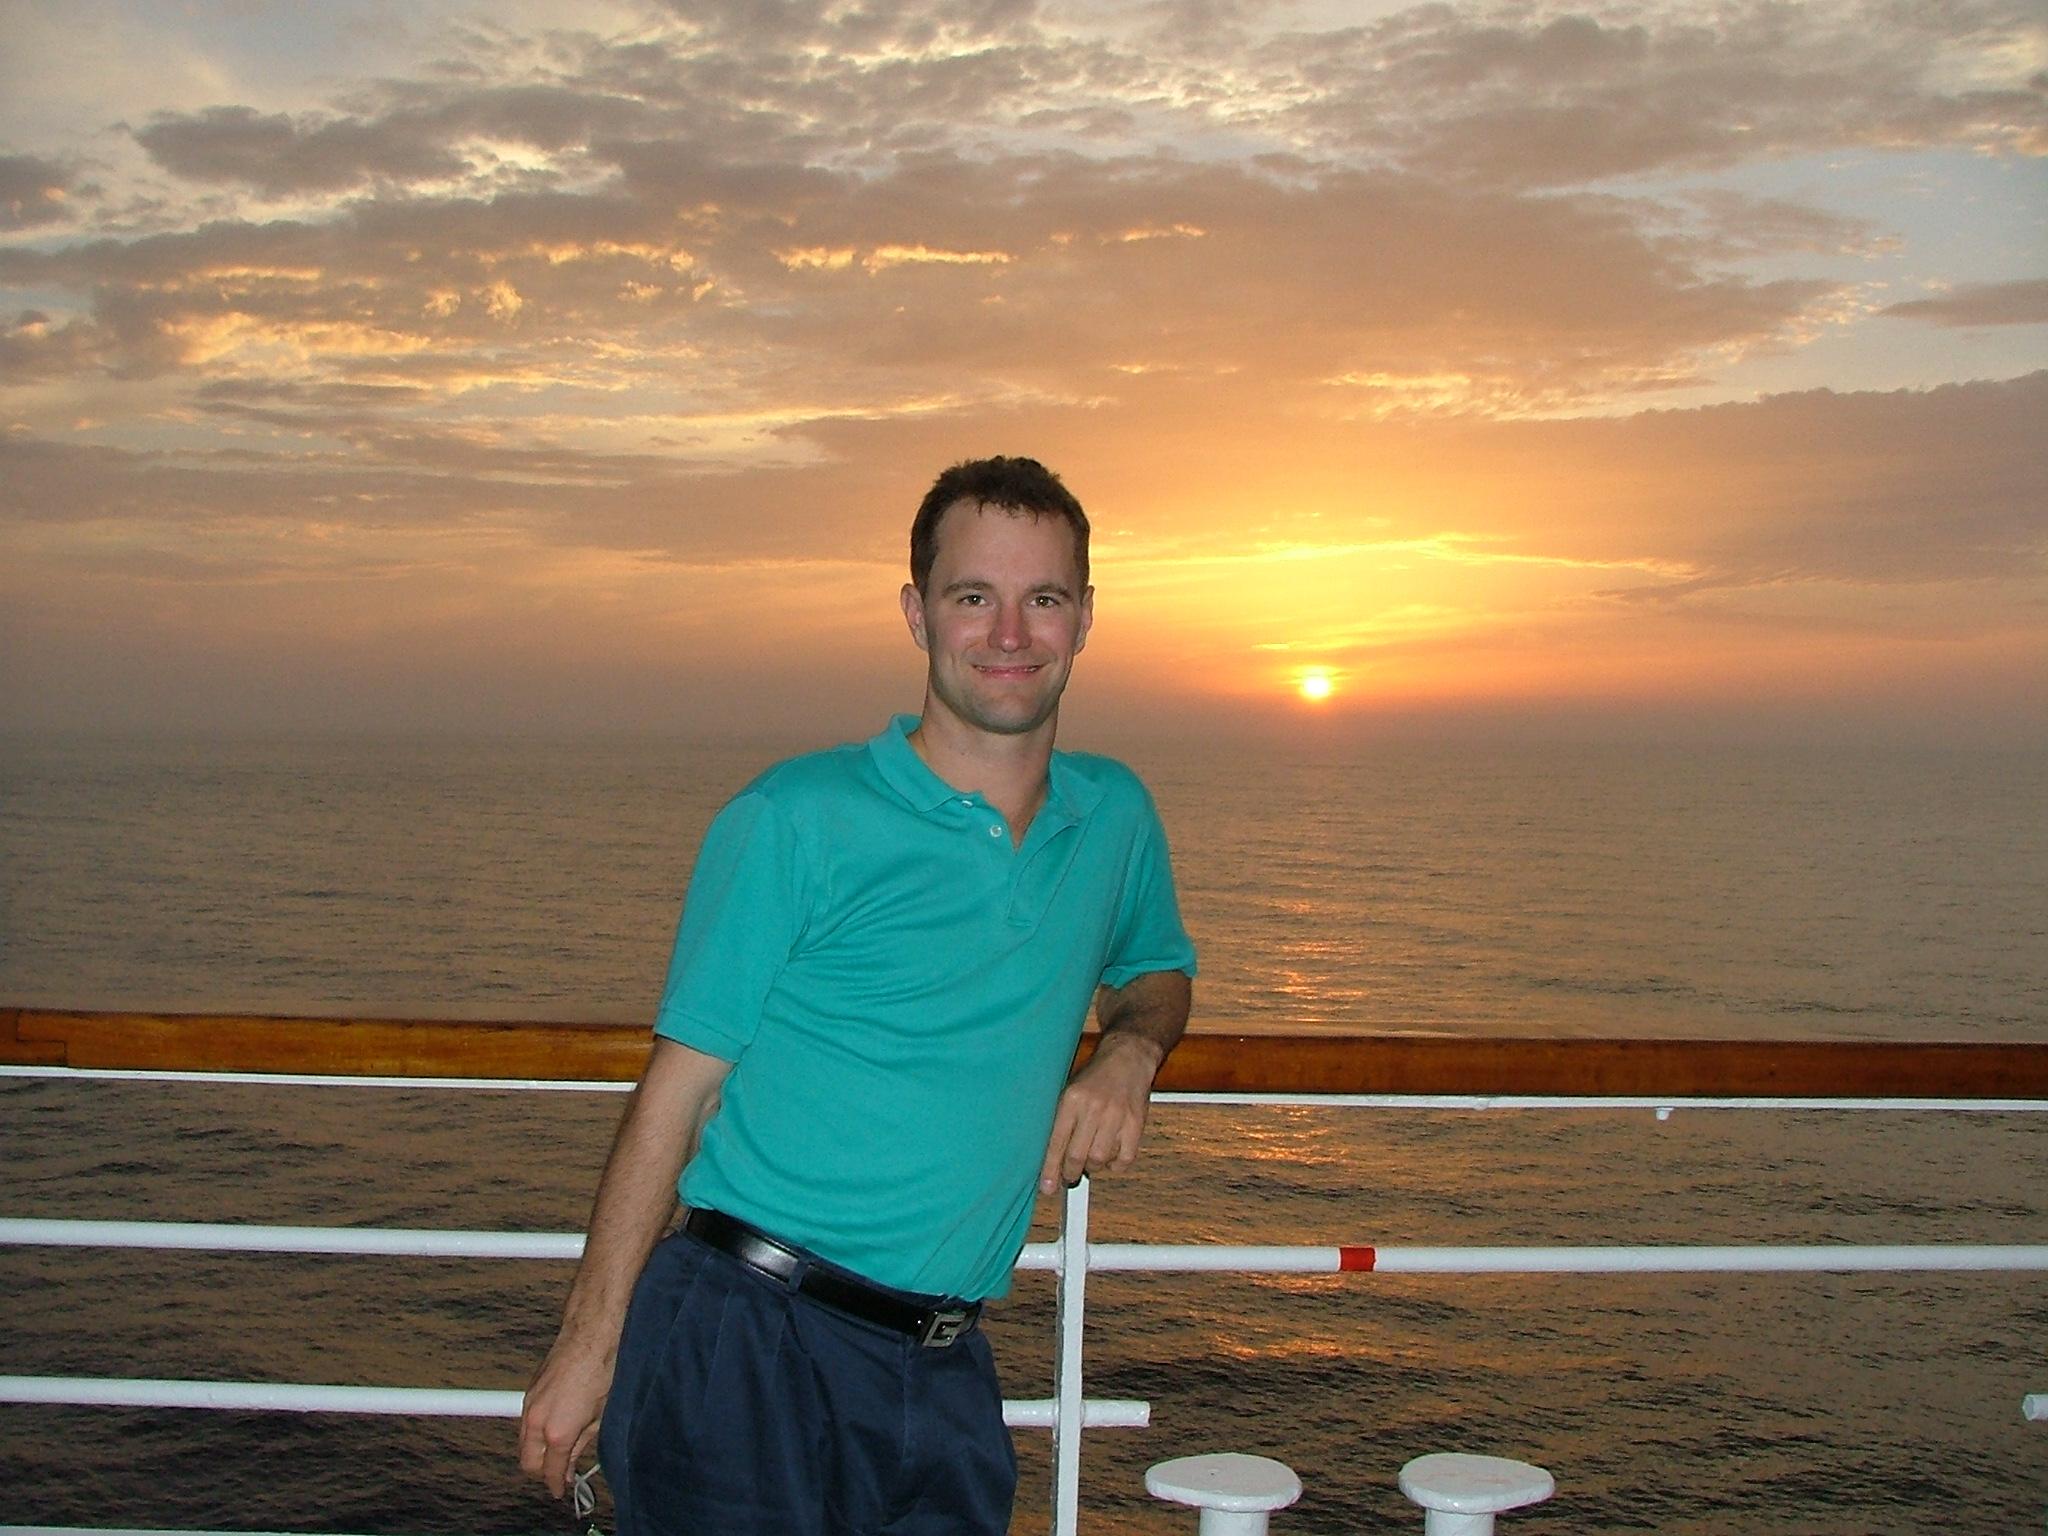 Mike's Mediterranean sunset.